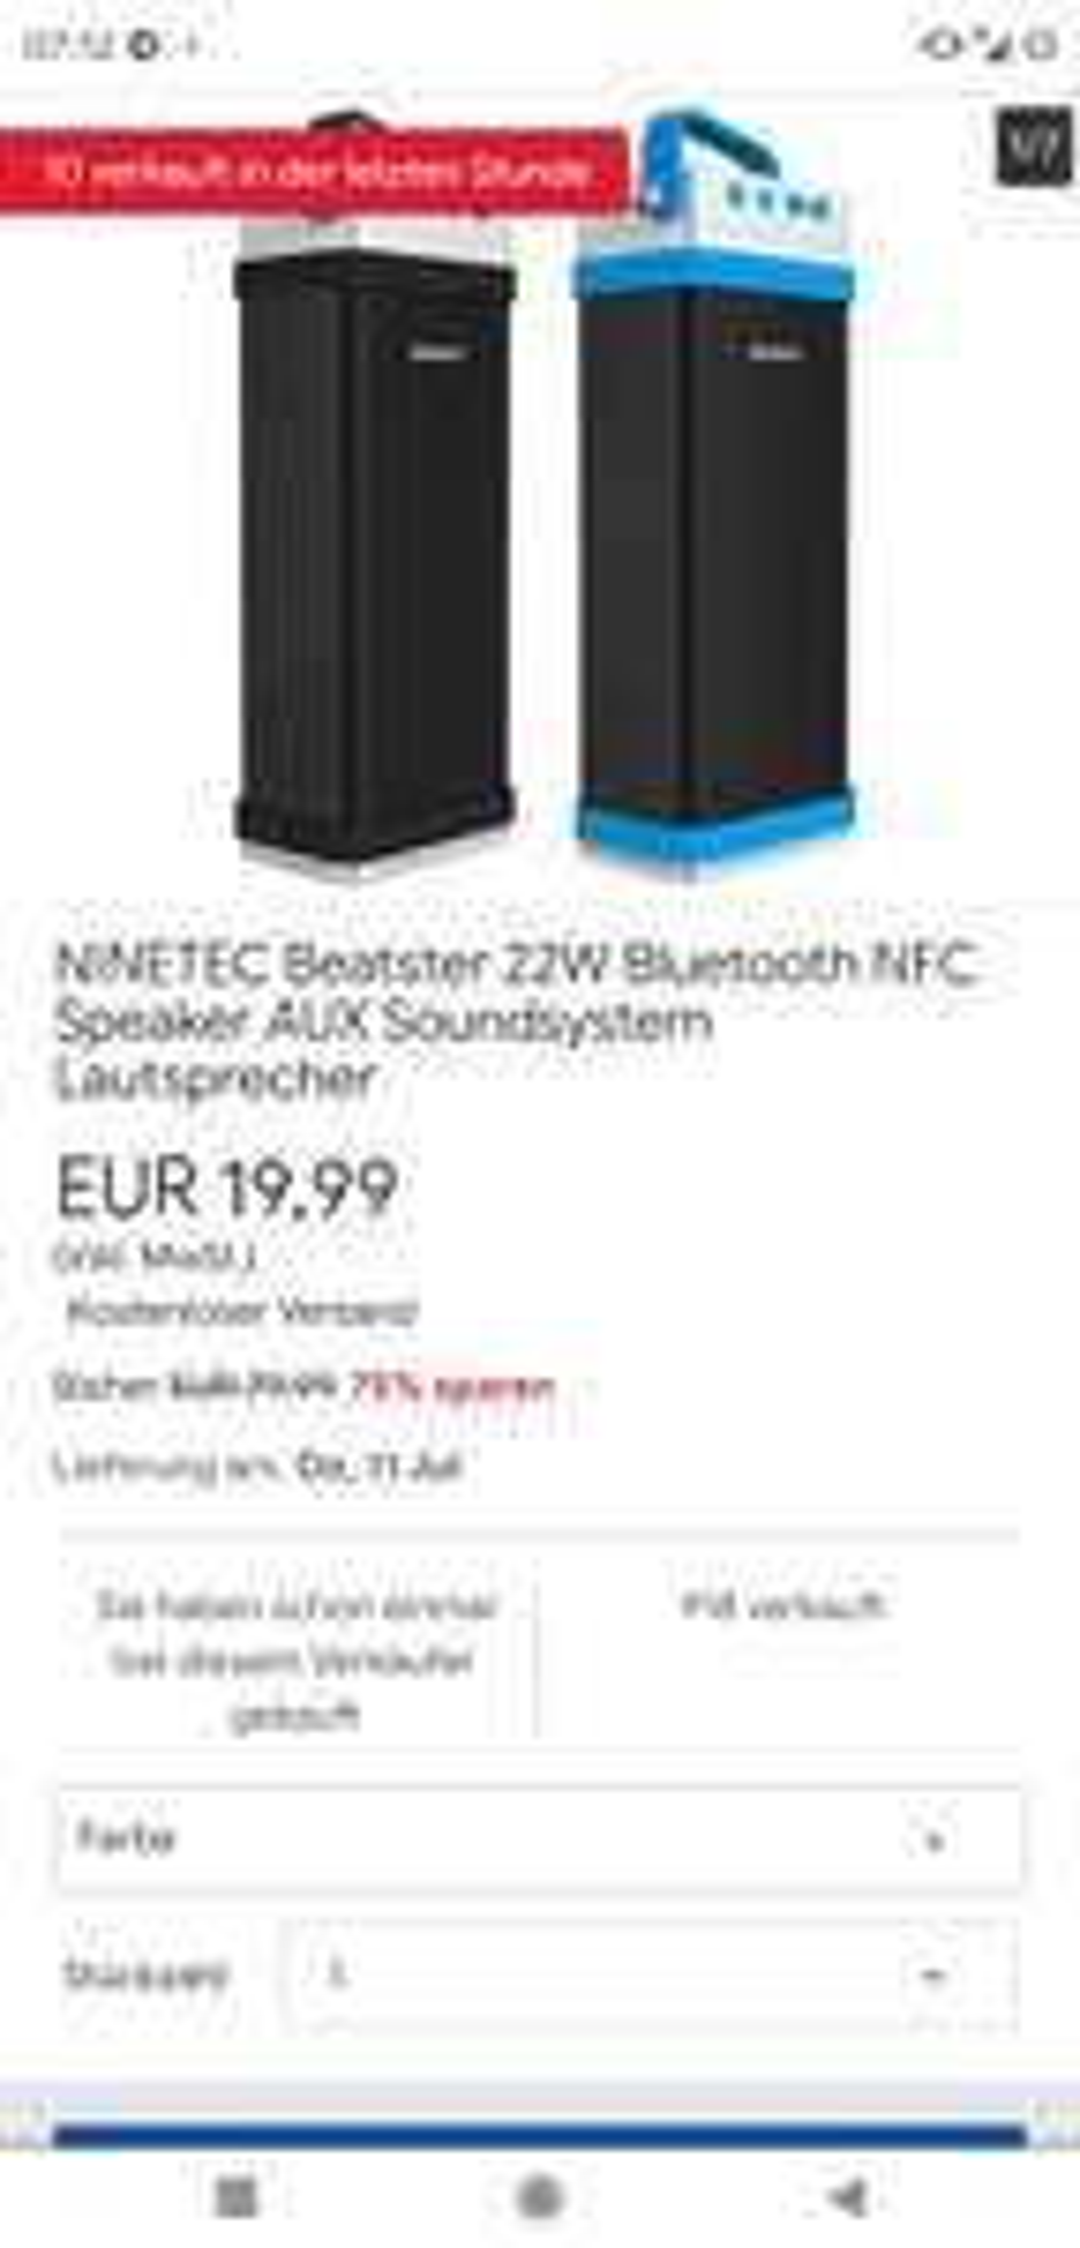 NINETEC Beatster 22W Bluetooth NFC Speaker AUX Soundsystem Lautsprecher